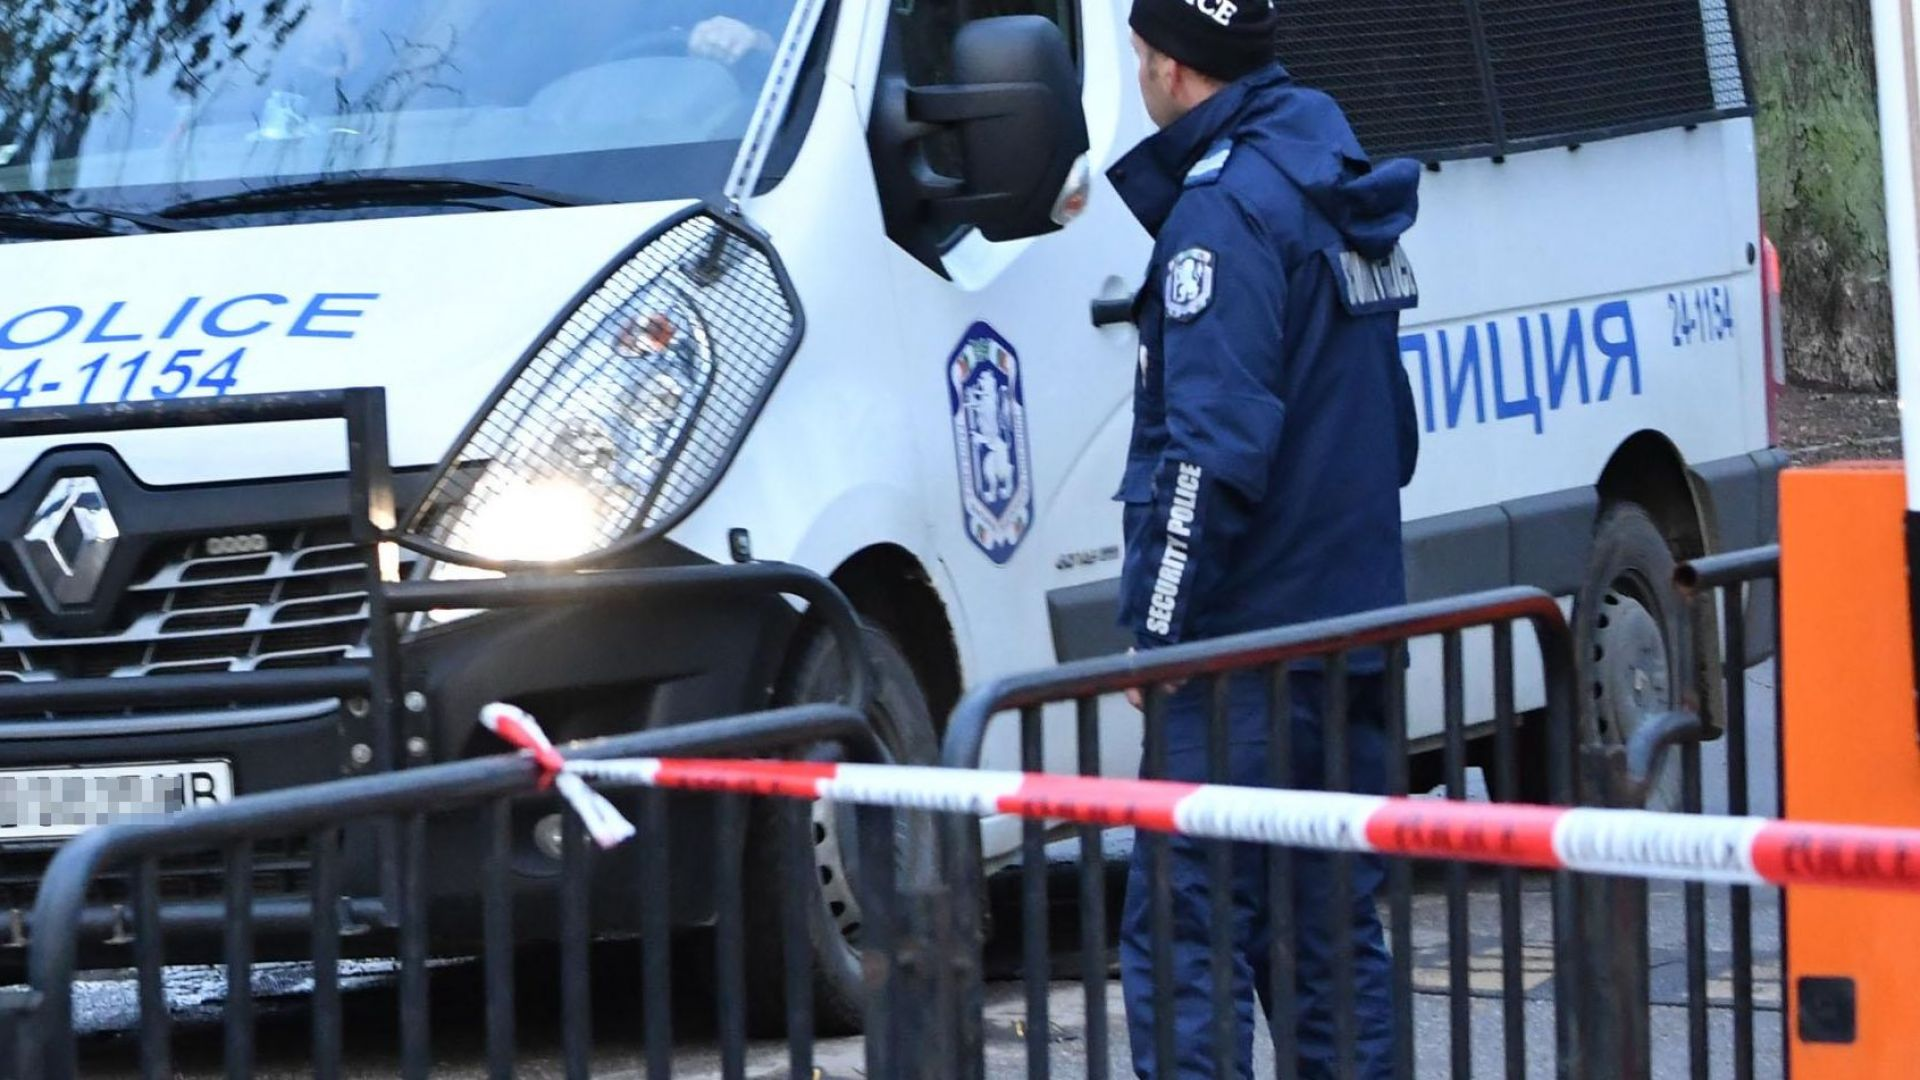 Екшън в Своге: двама се сбиха, трети ги простреля